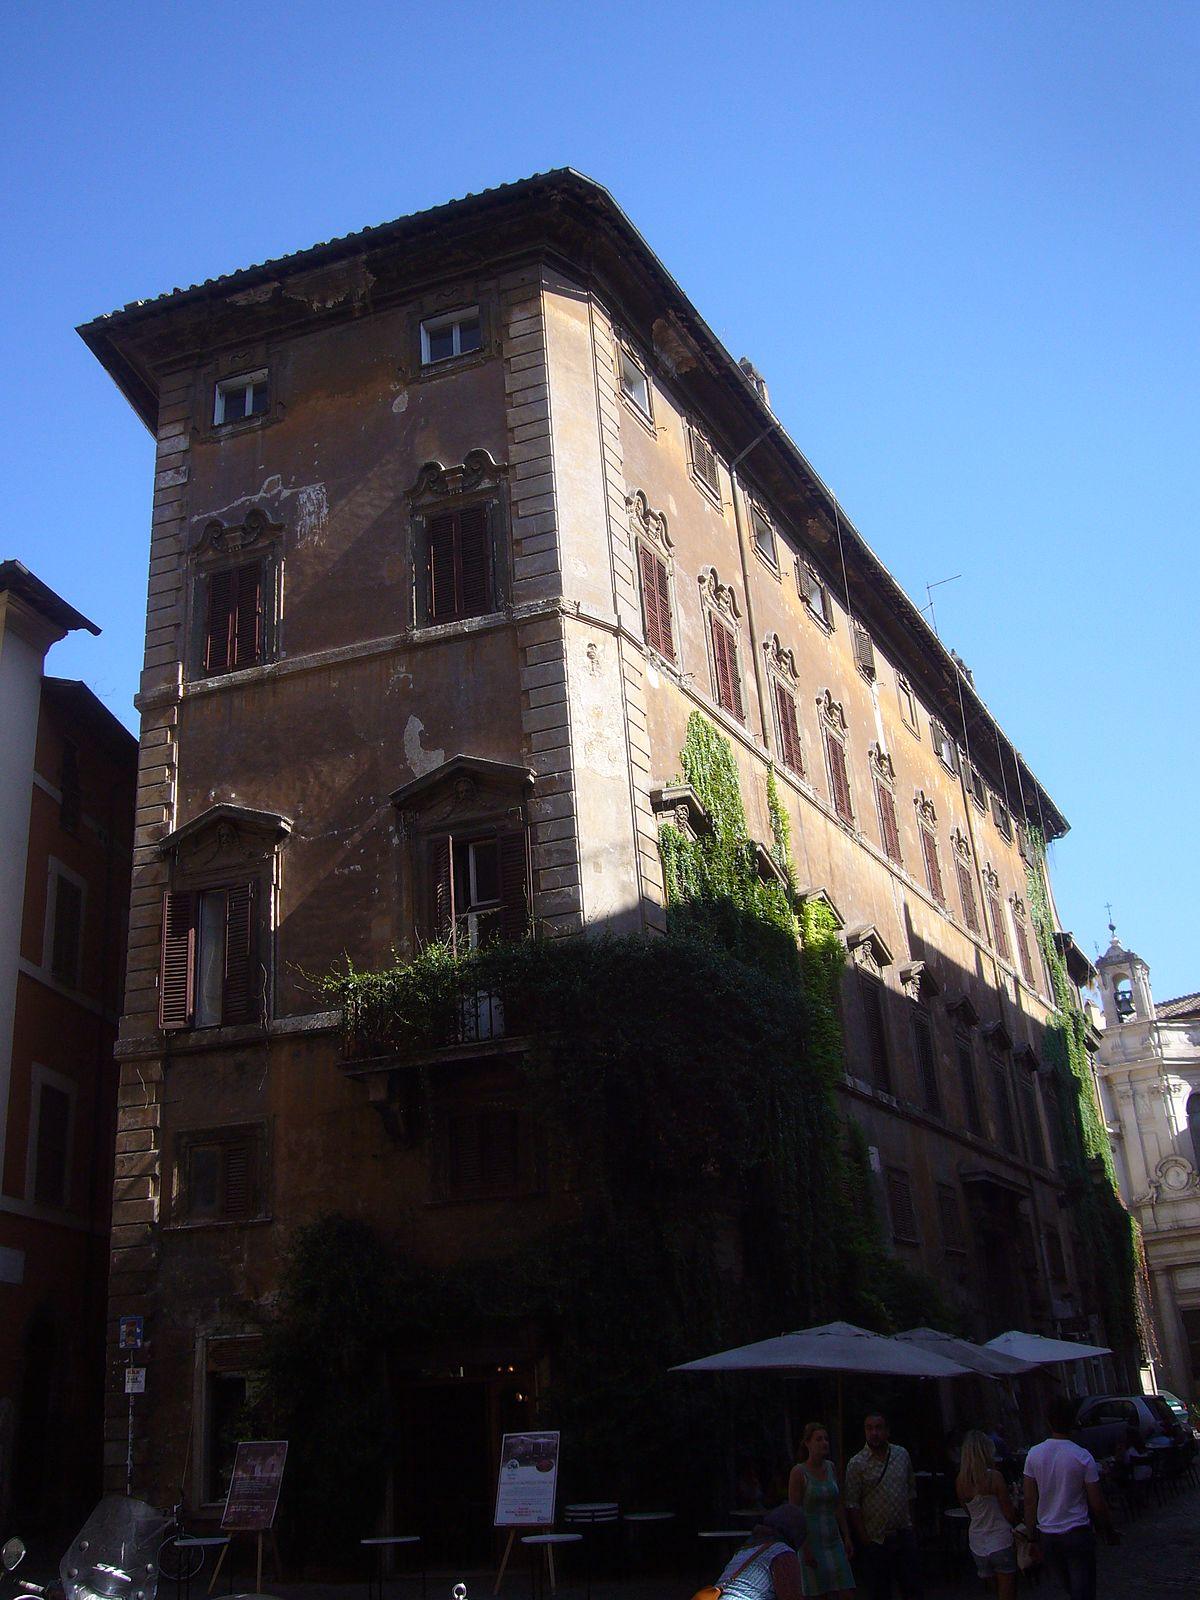 Palazzo gambirasi wikipedia - Architetto palazzo congressi roma ...